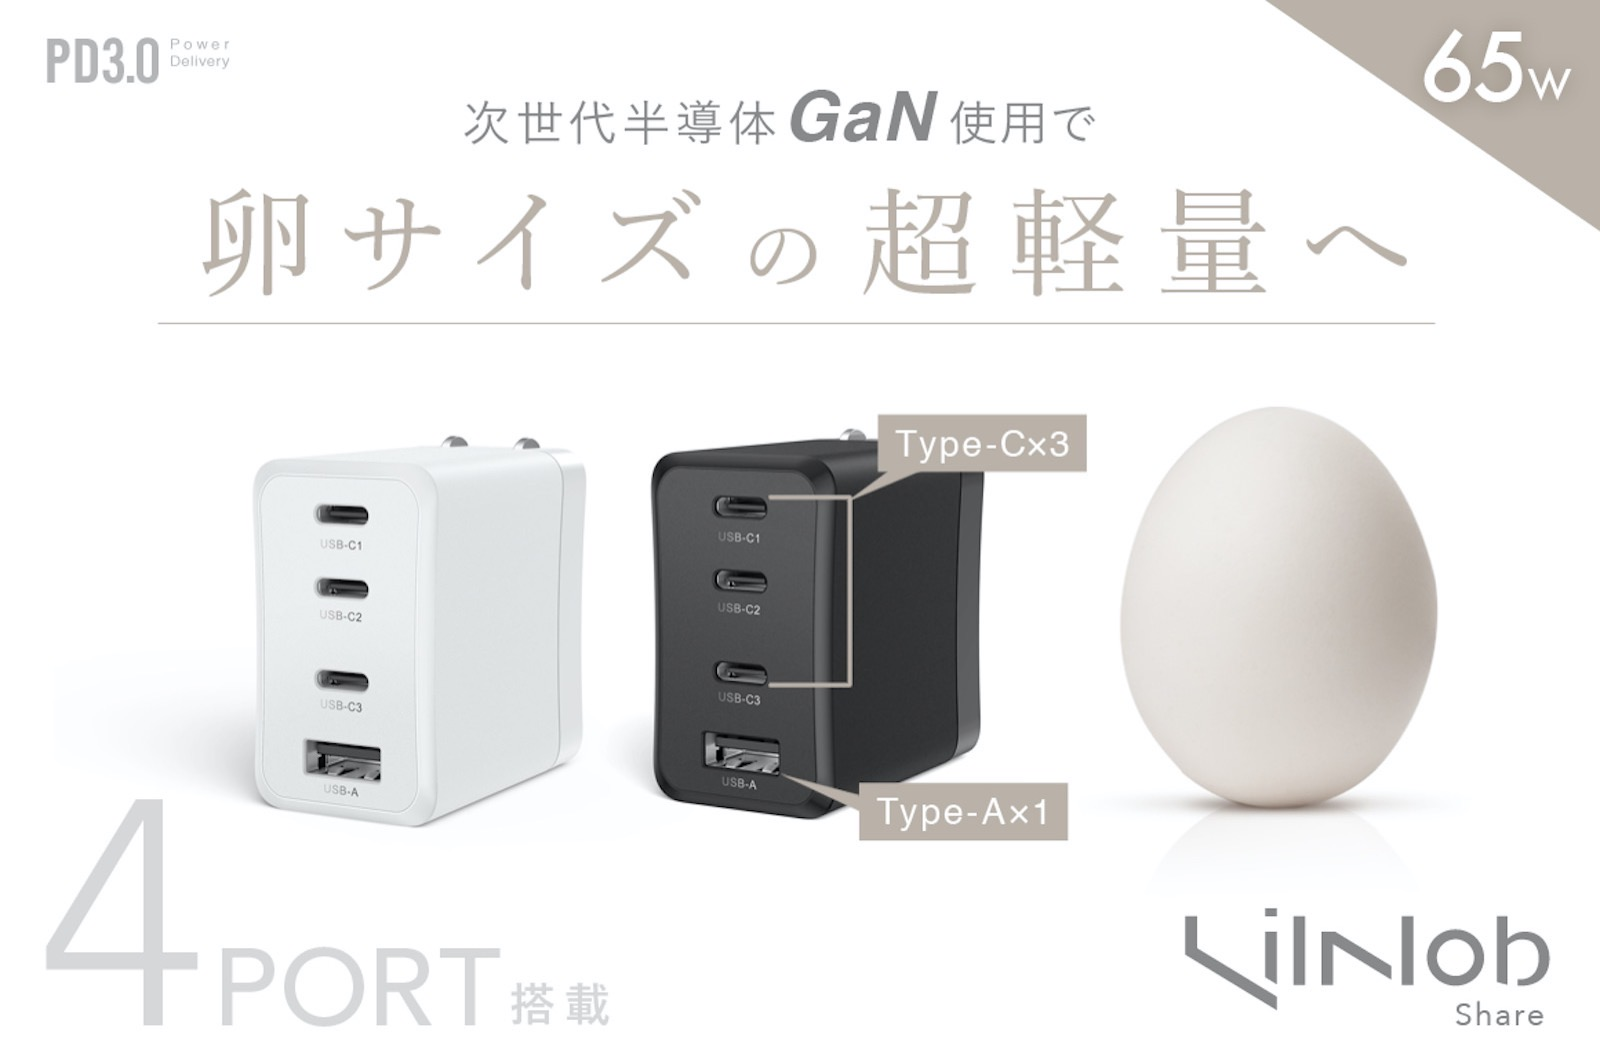 LilNob Share GaN 65W charger